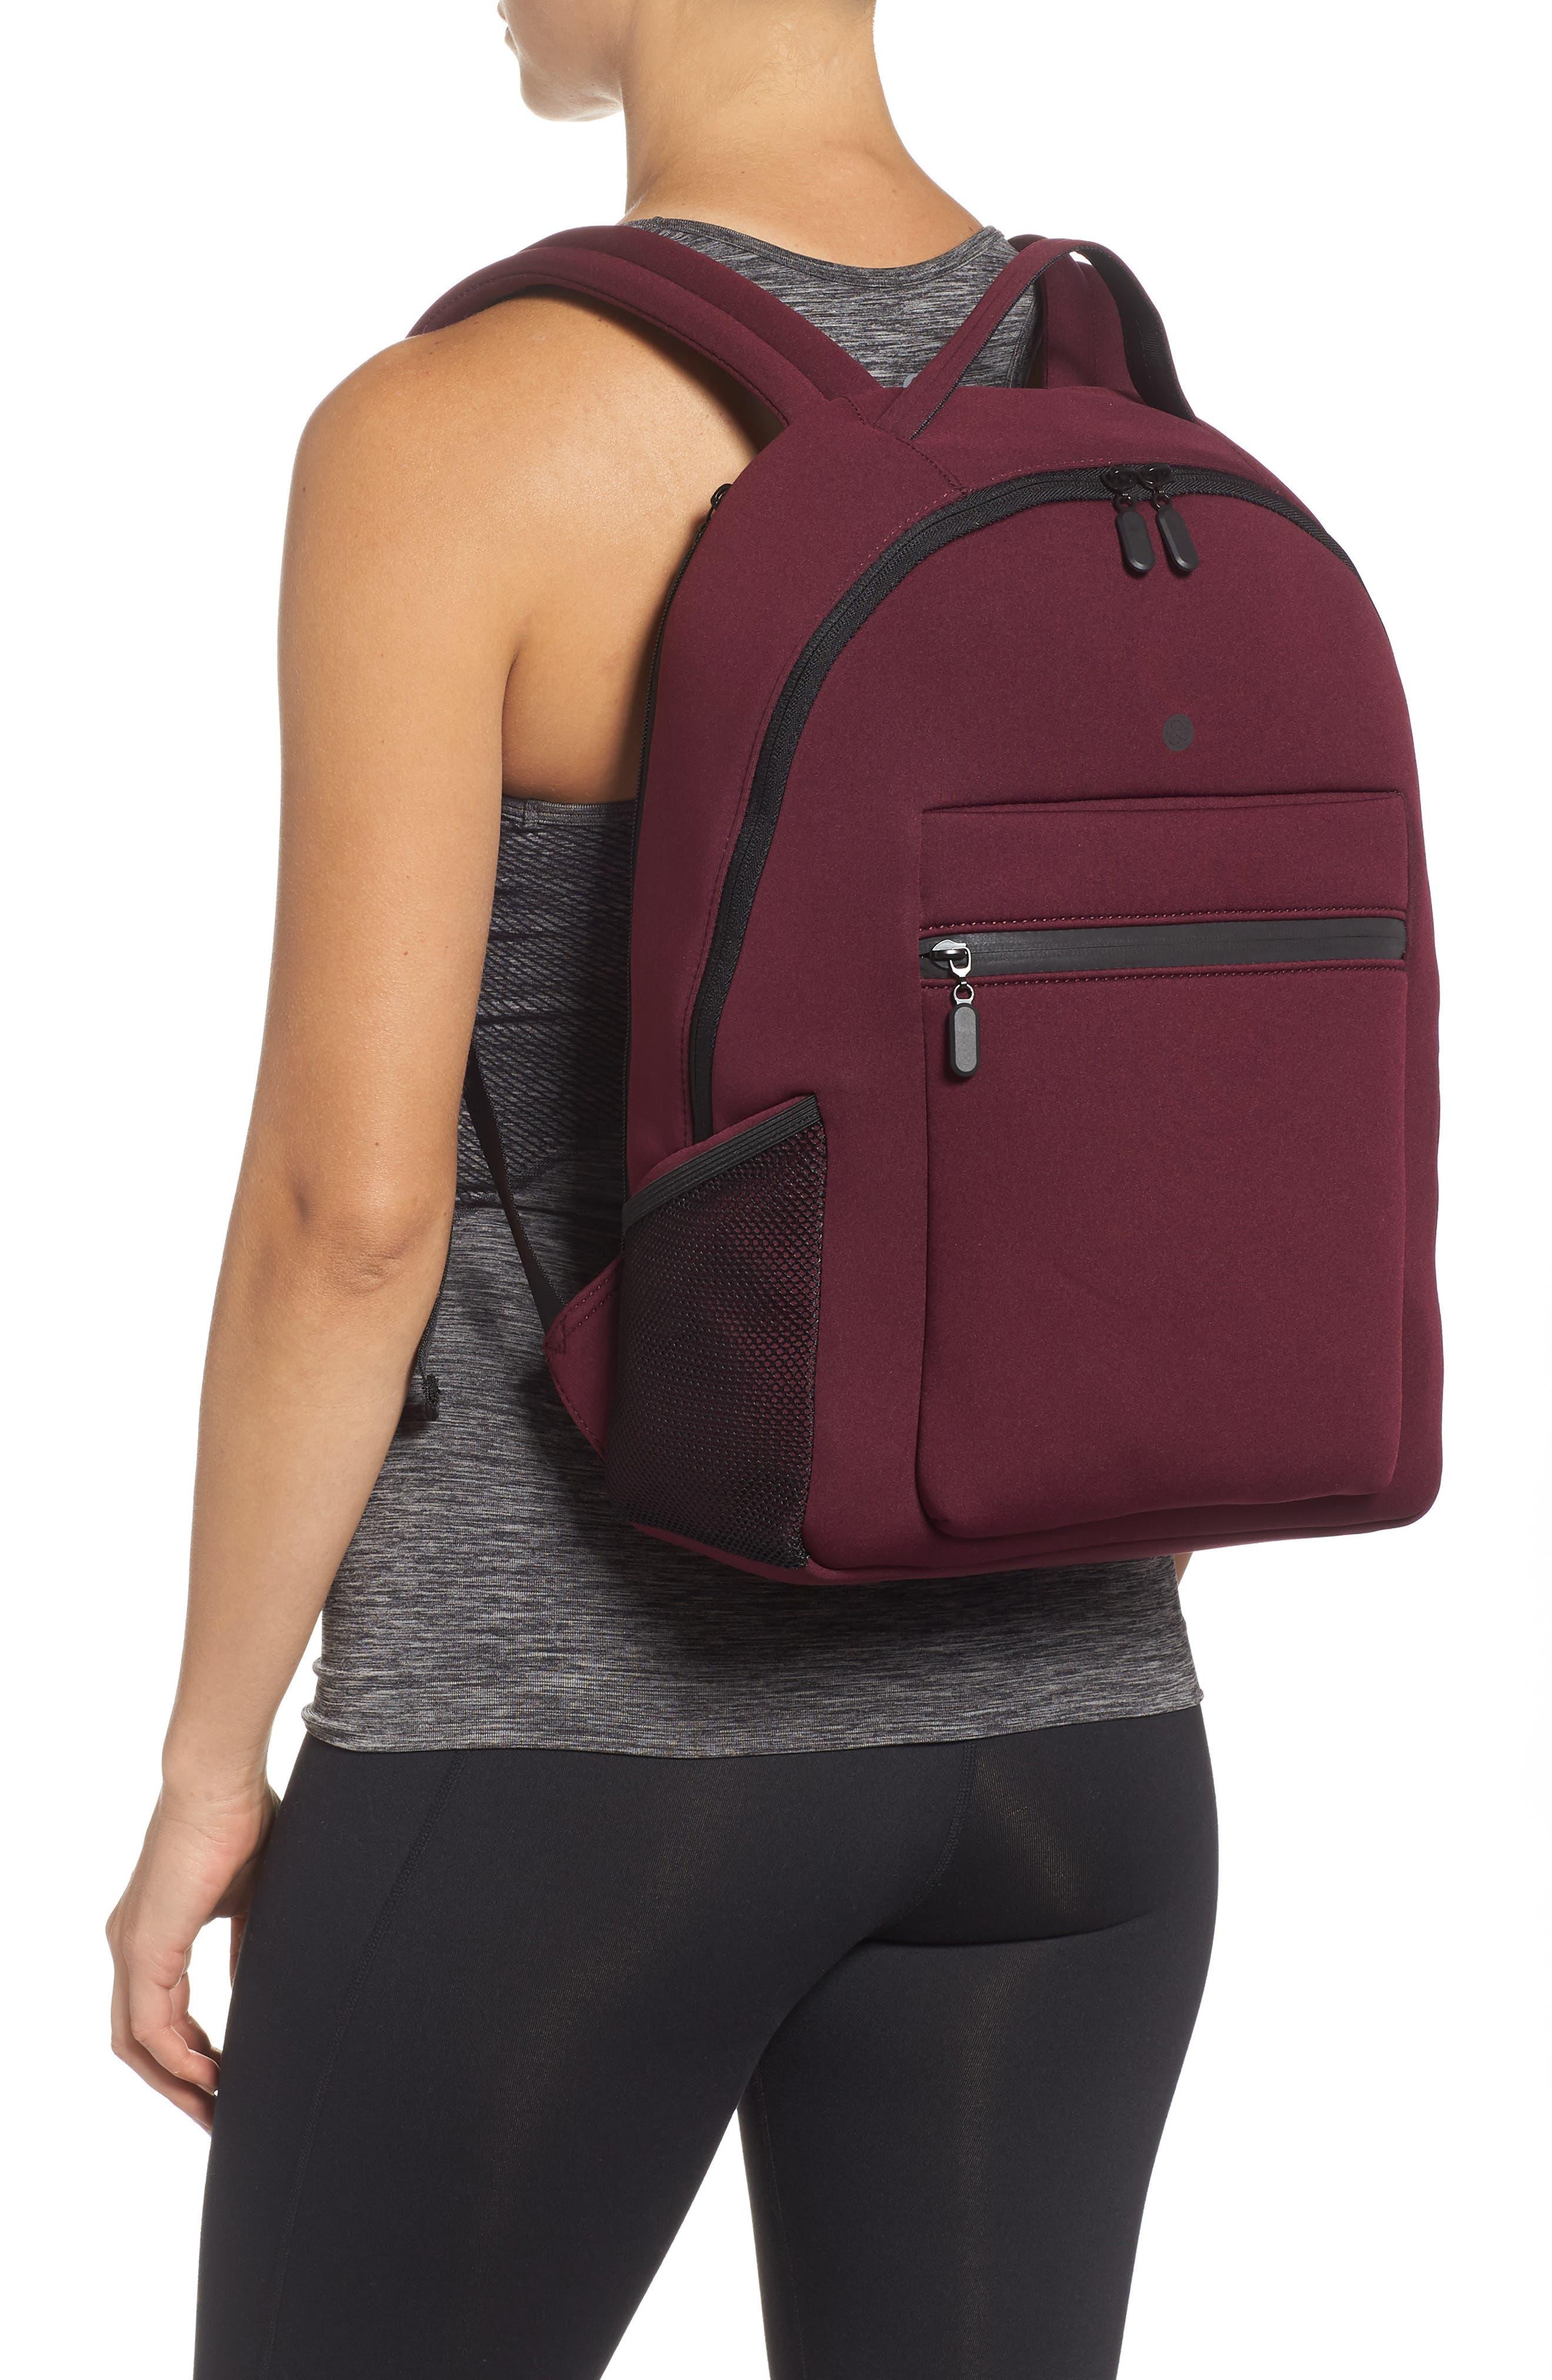 Baseline Backpack,                             Alternate thumbnail 2, color,                             RED TANNIN